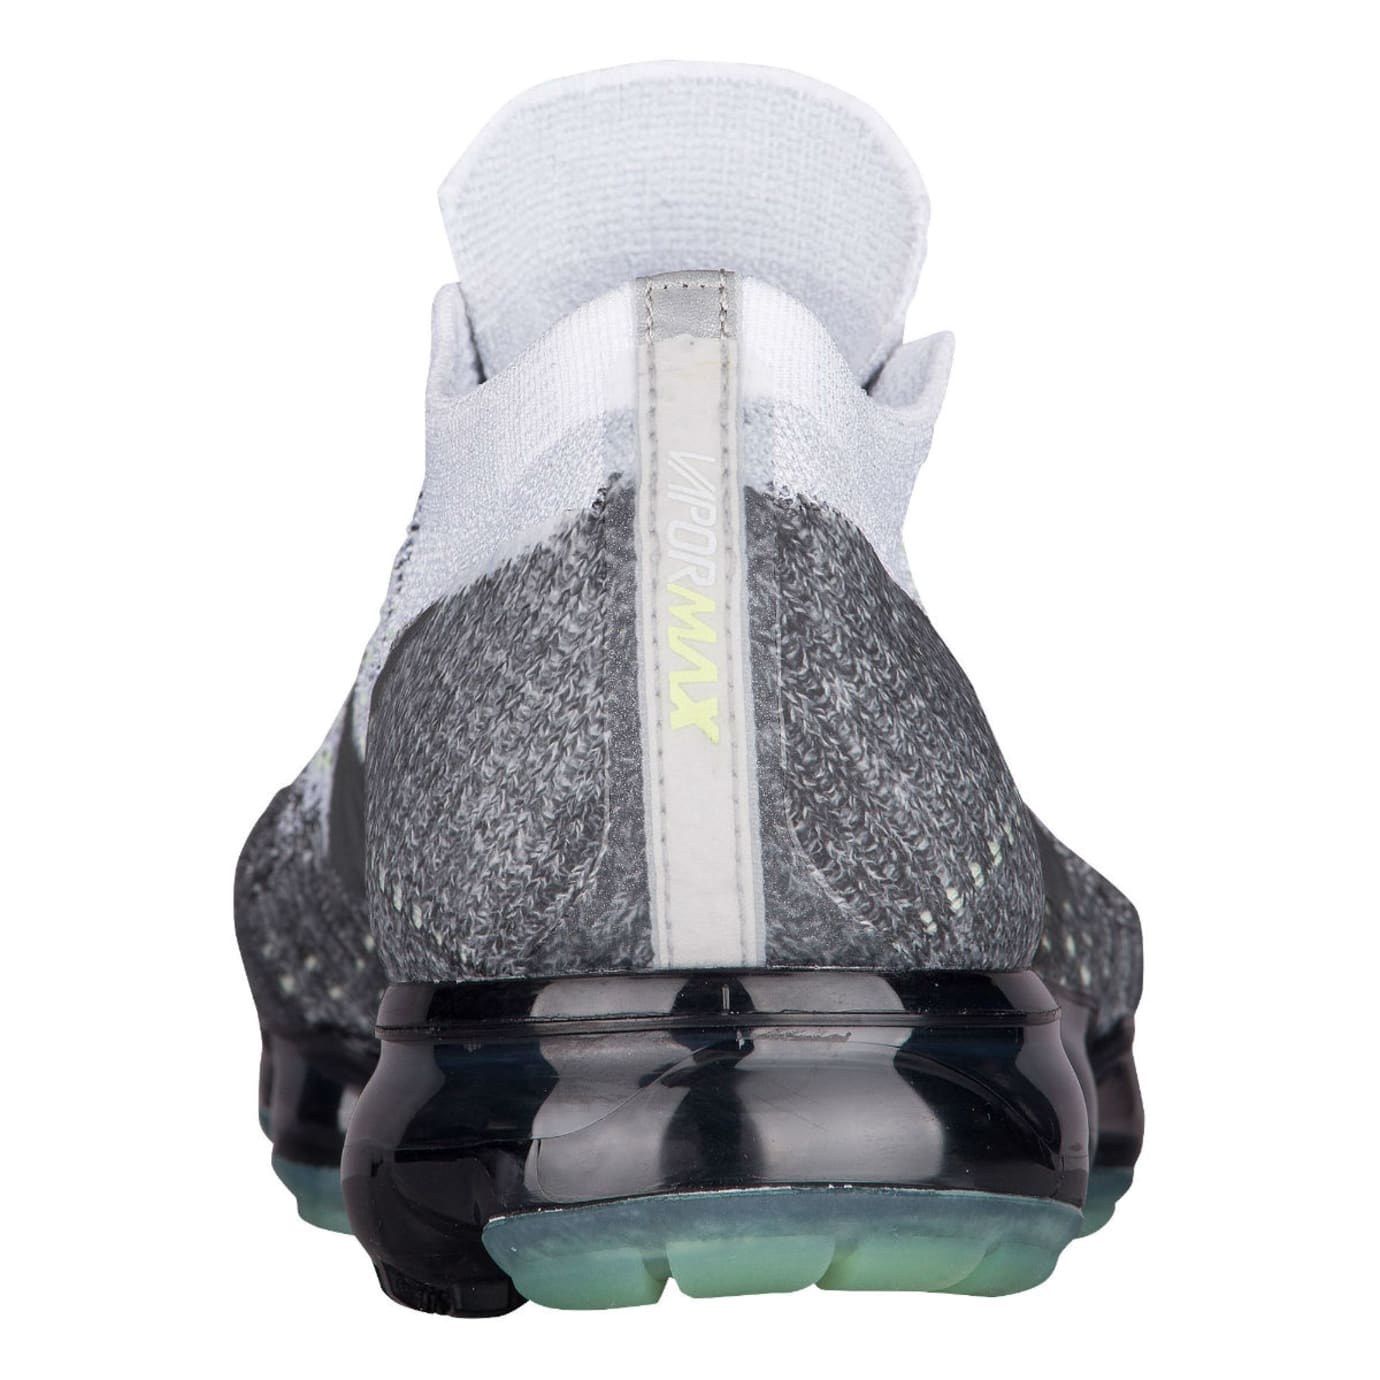 8d1ba7bcbde33 Nike Air VaporMax Flyknit Heritage Pack Pure Platinum White Dark Grey Release  Date 922915-002